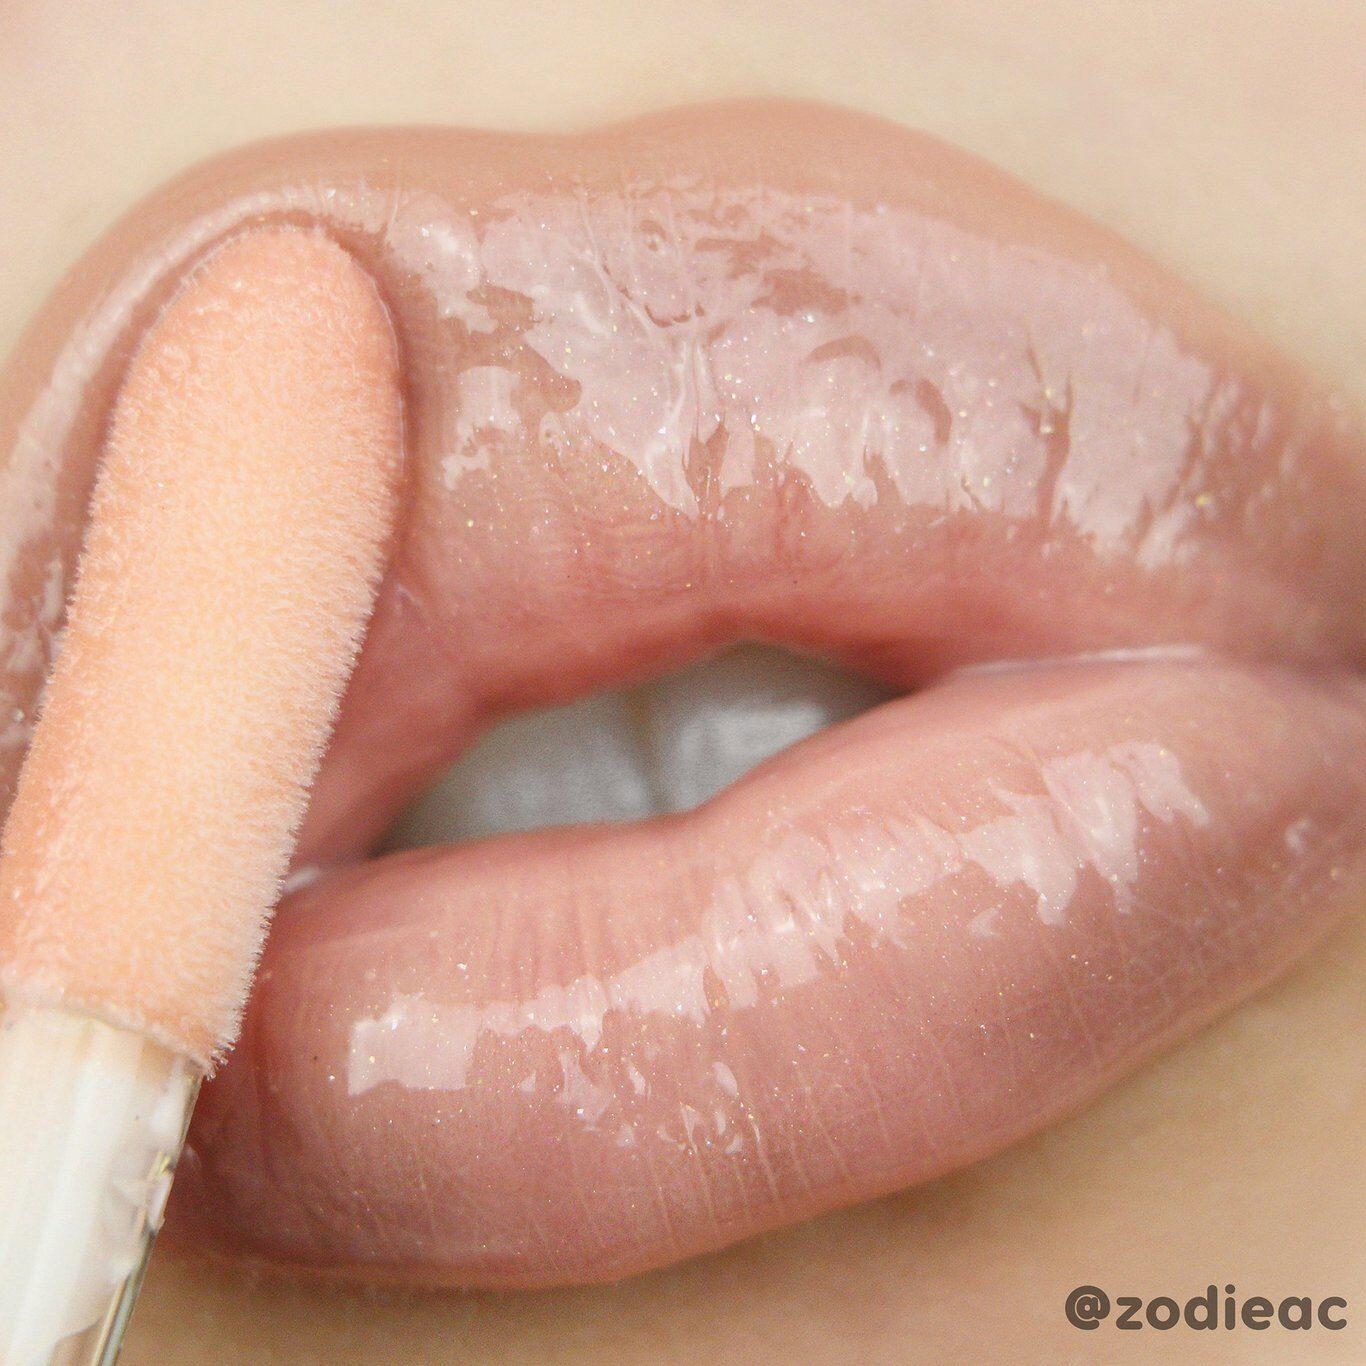 Raw Beauty Kristi x Colourpop Lux Gloss In Glacier Lip Swatch